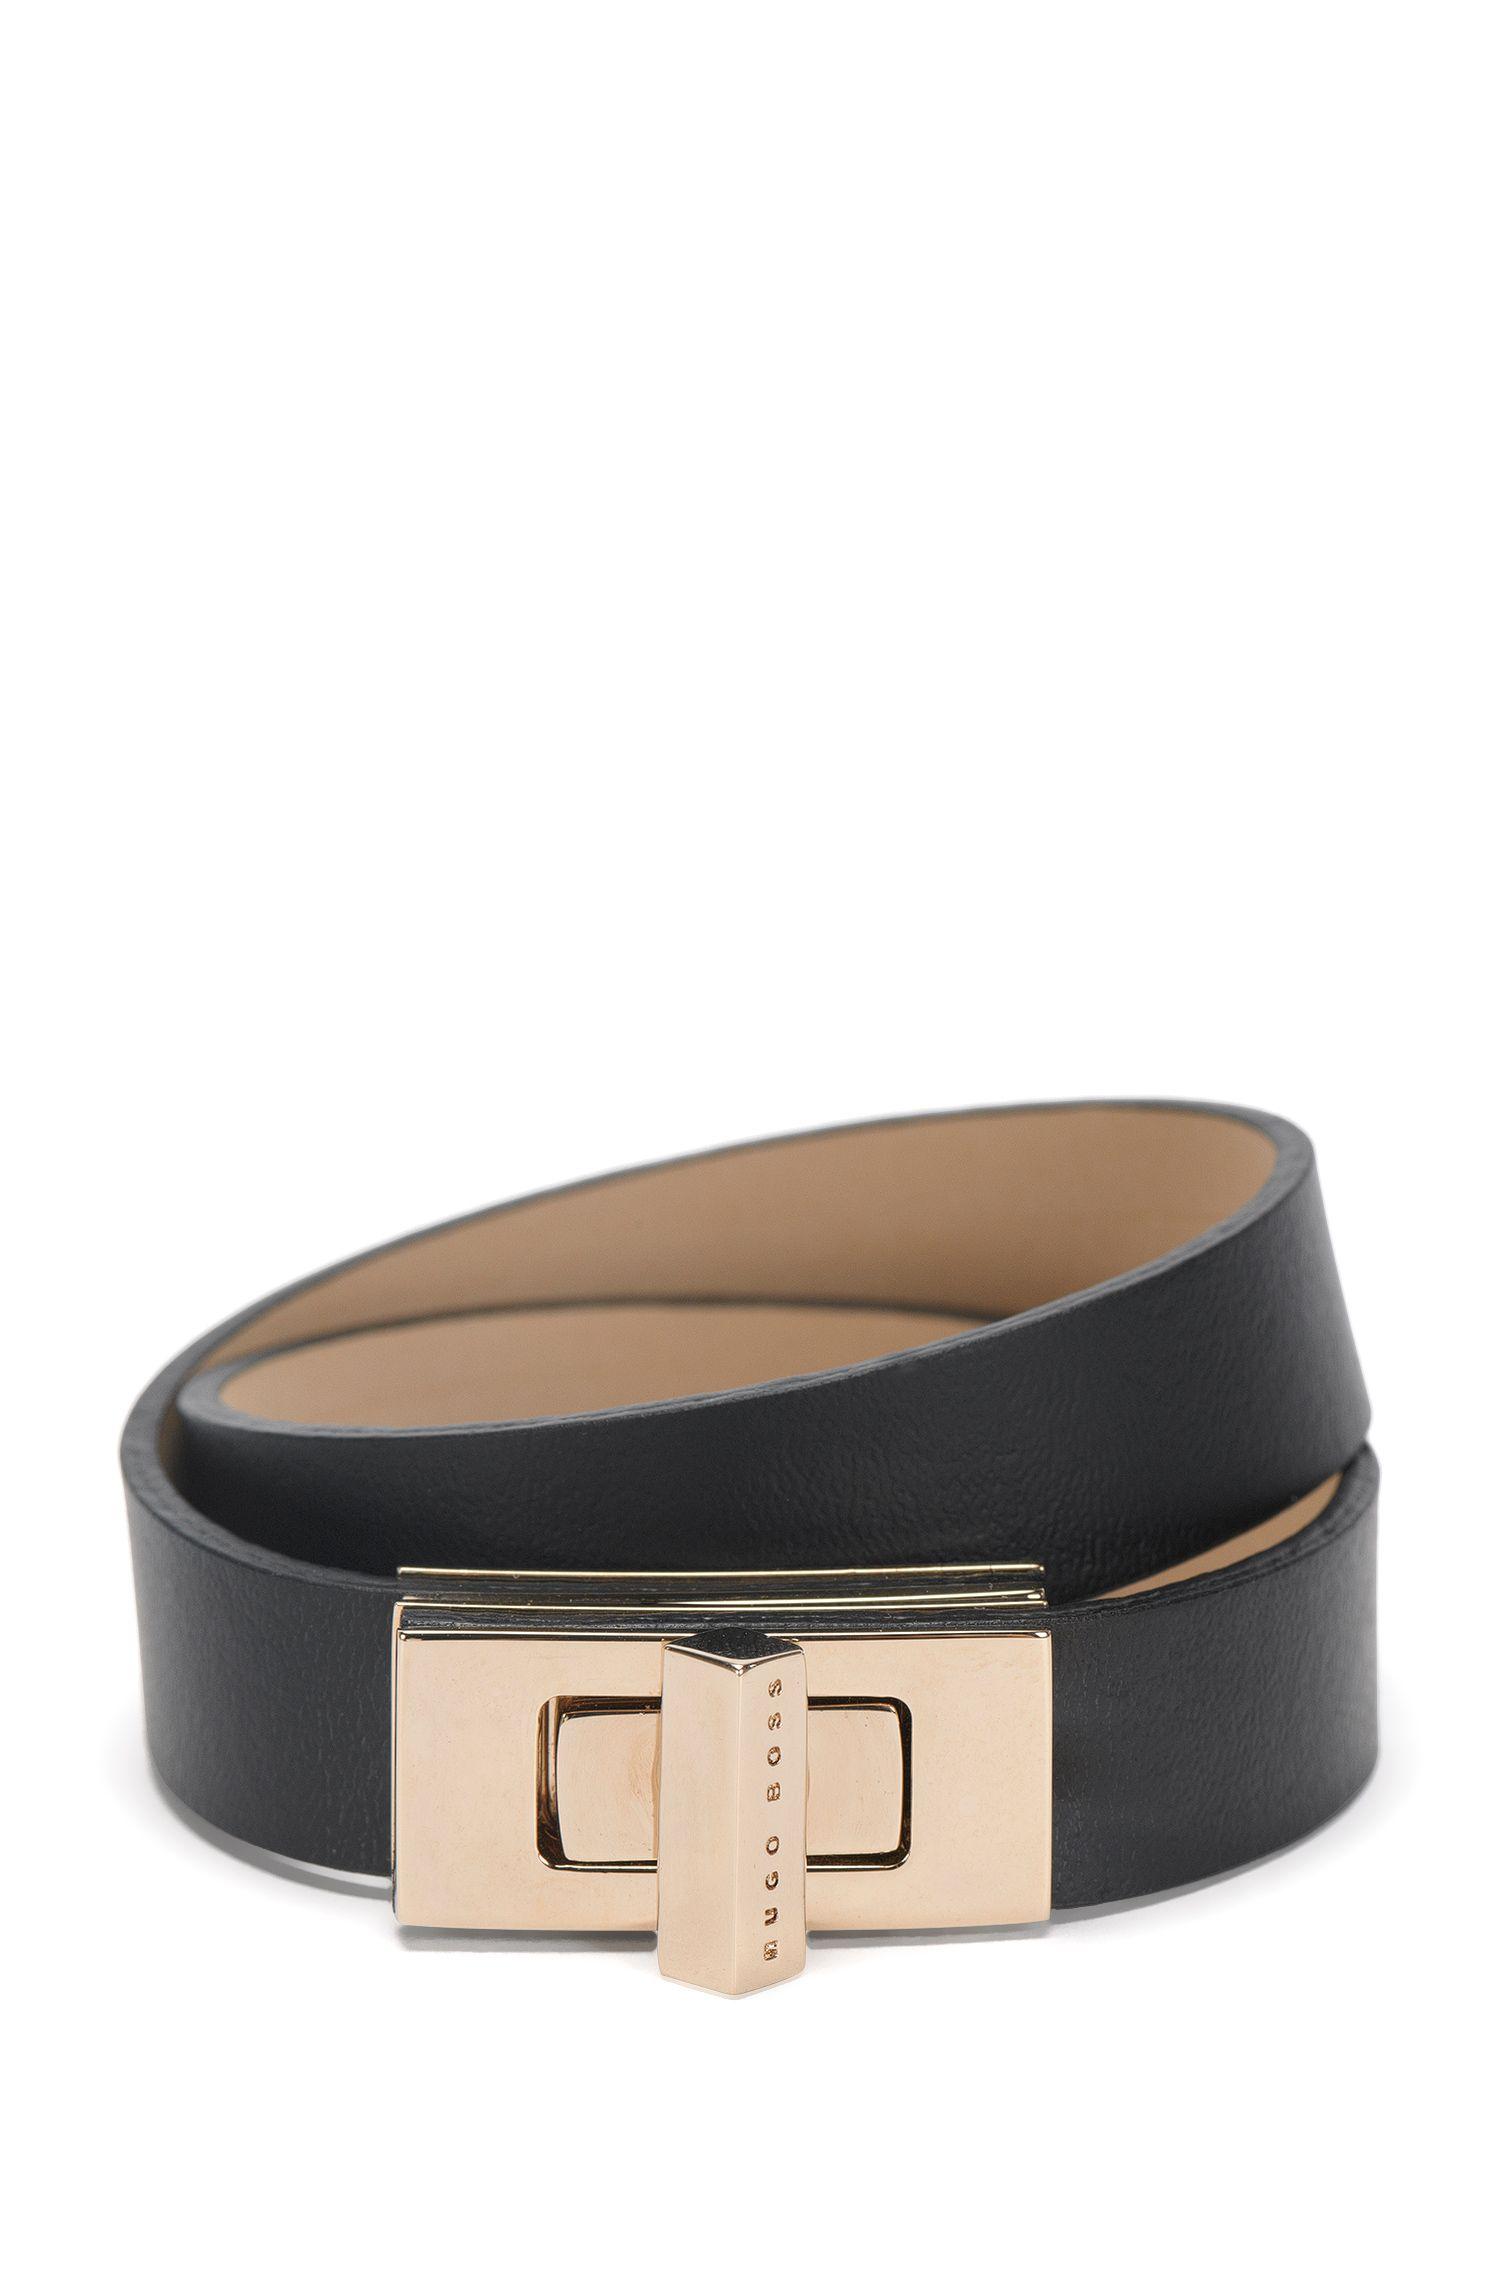 Leren BOSS Bespoke-armband met kenmerkende manchetknoopsluiting